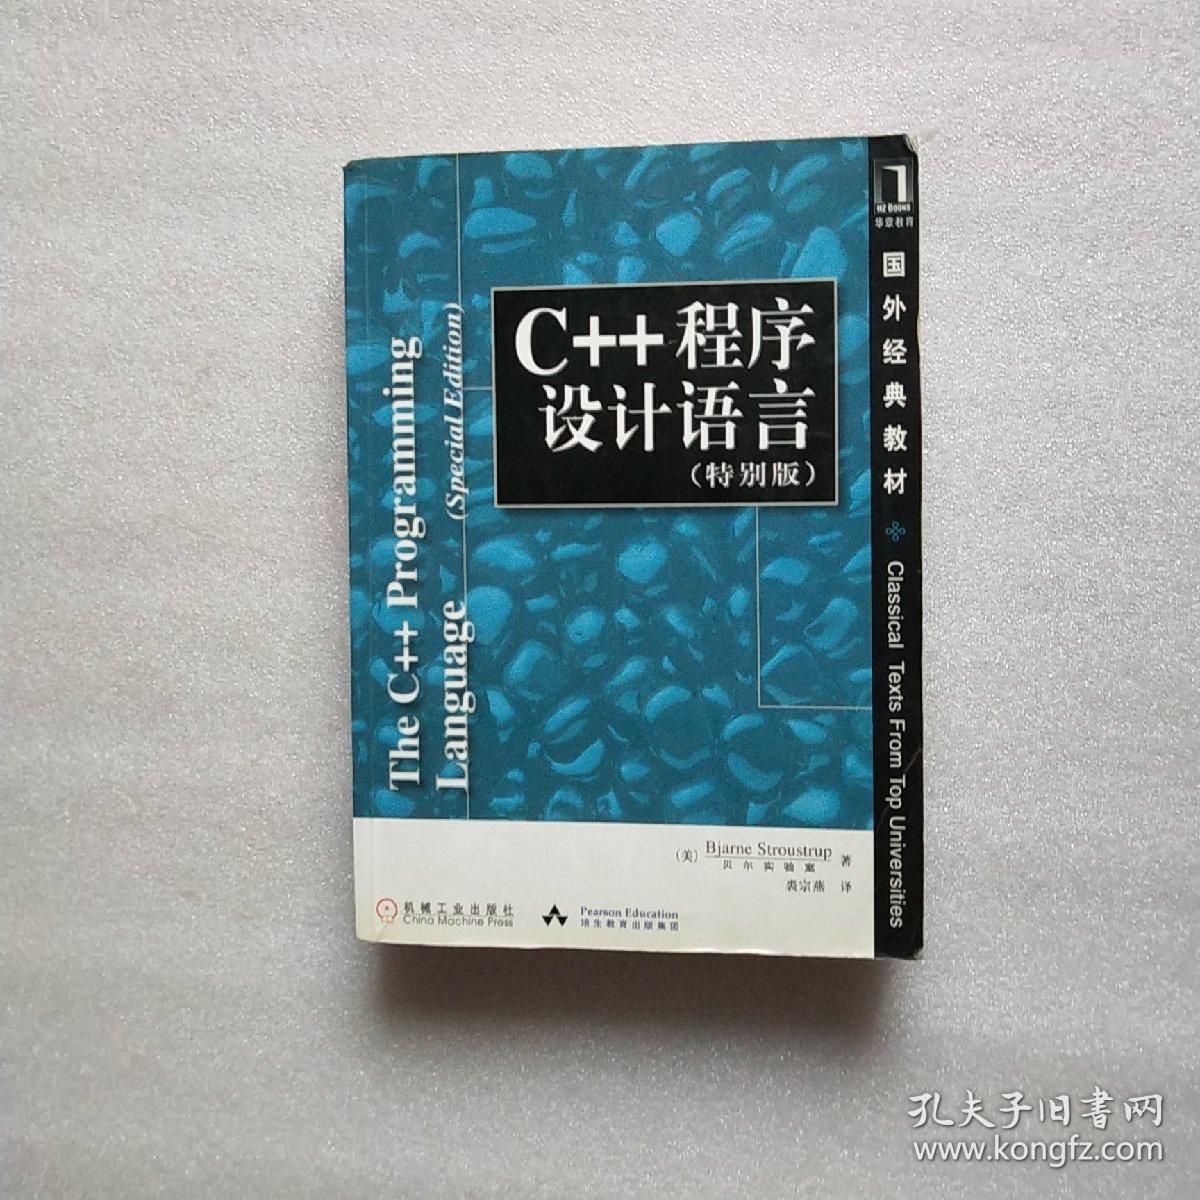 c程序設計語言(第2版·新版)非掃描版&詳細書簽版_c++程序設計語言特別版_高質量程序設計指南c c語言 第三版